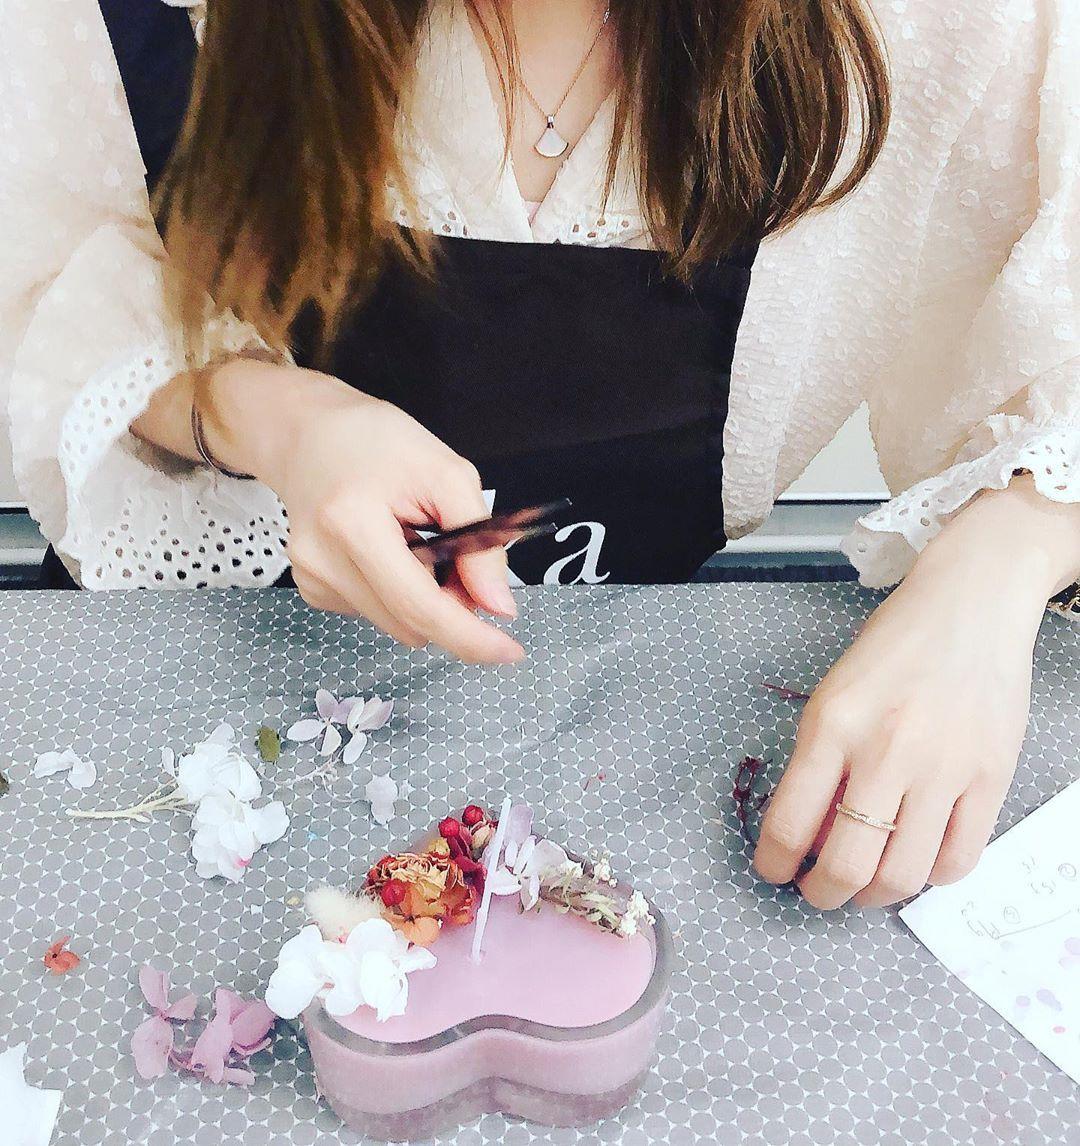 Student S Work Happy Wedding Rikkastudio Natural Craftworkshop Lifeinsydney Handm Handmade Candles Candle Maker Crafts Workshop